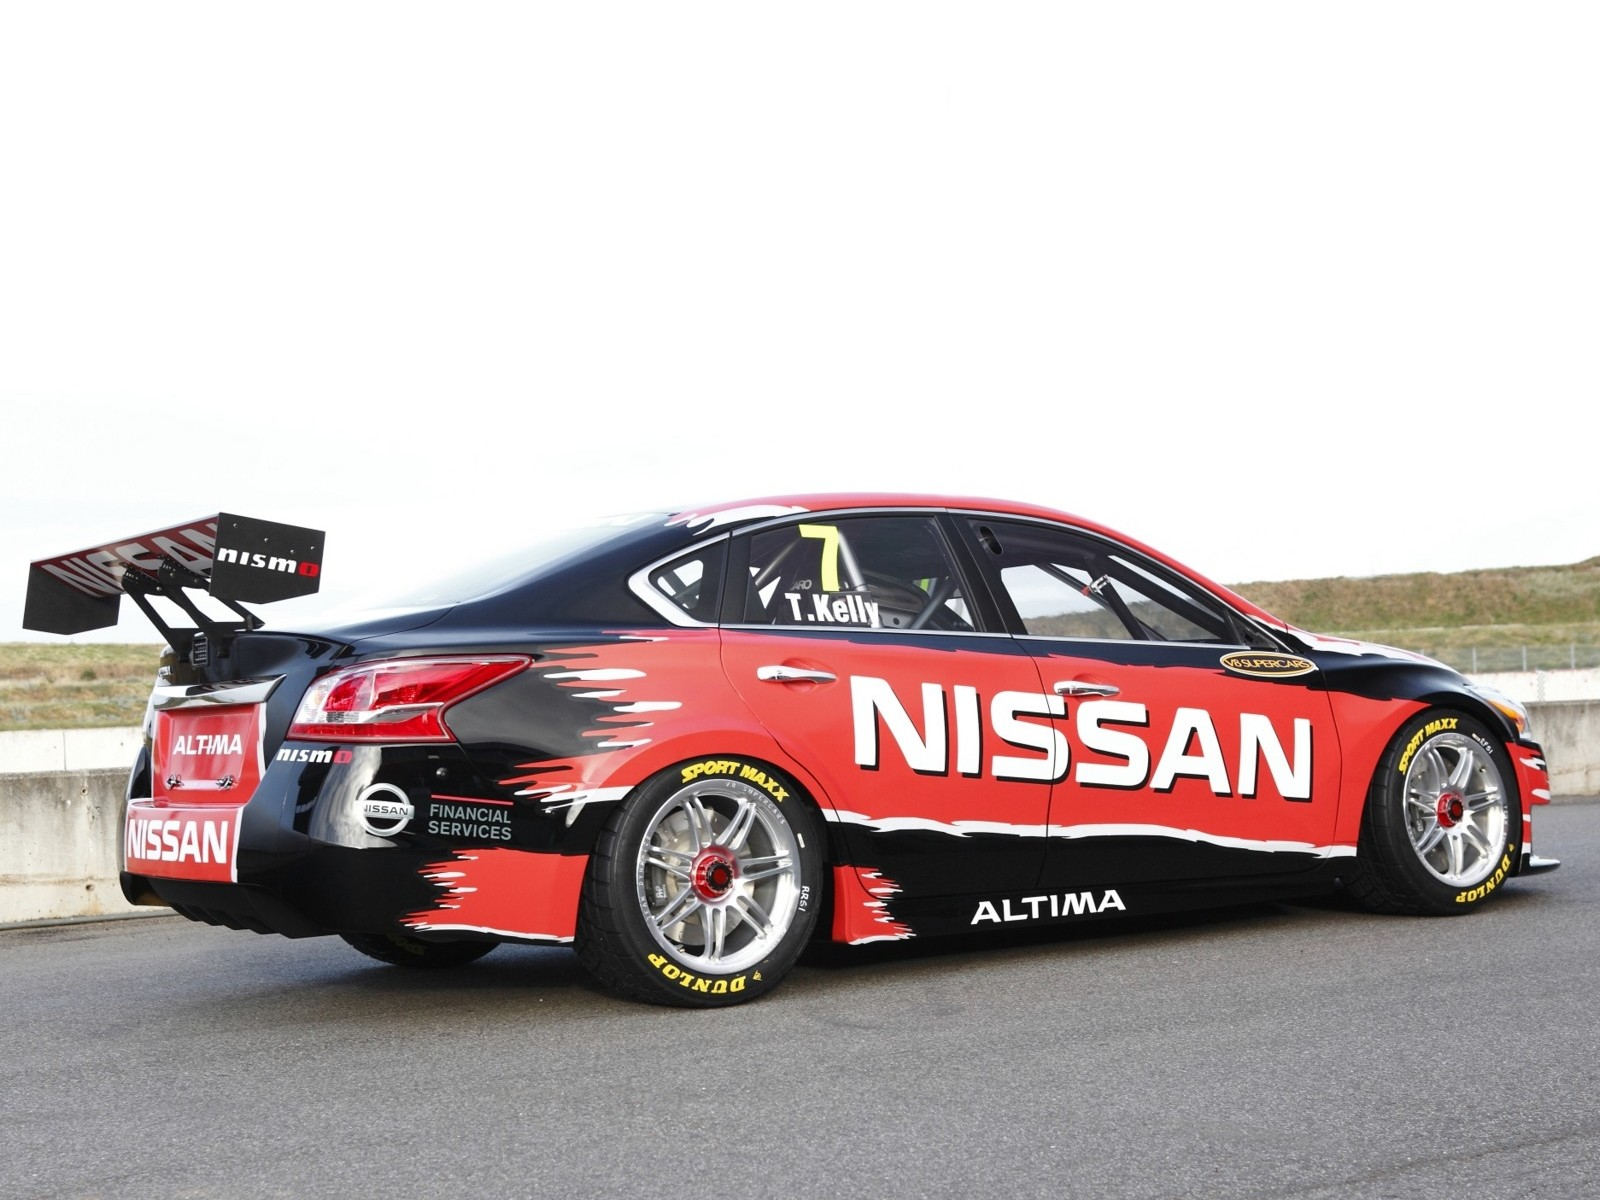 2012 nissan altima v 8 supercar l33 race racing h wallpaper 1600x1200 95273 wallpaperup. Black Bedroom Furniture Sets. Home Design Ideas